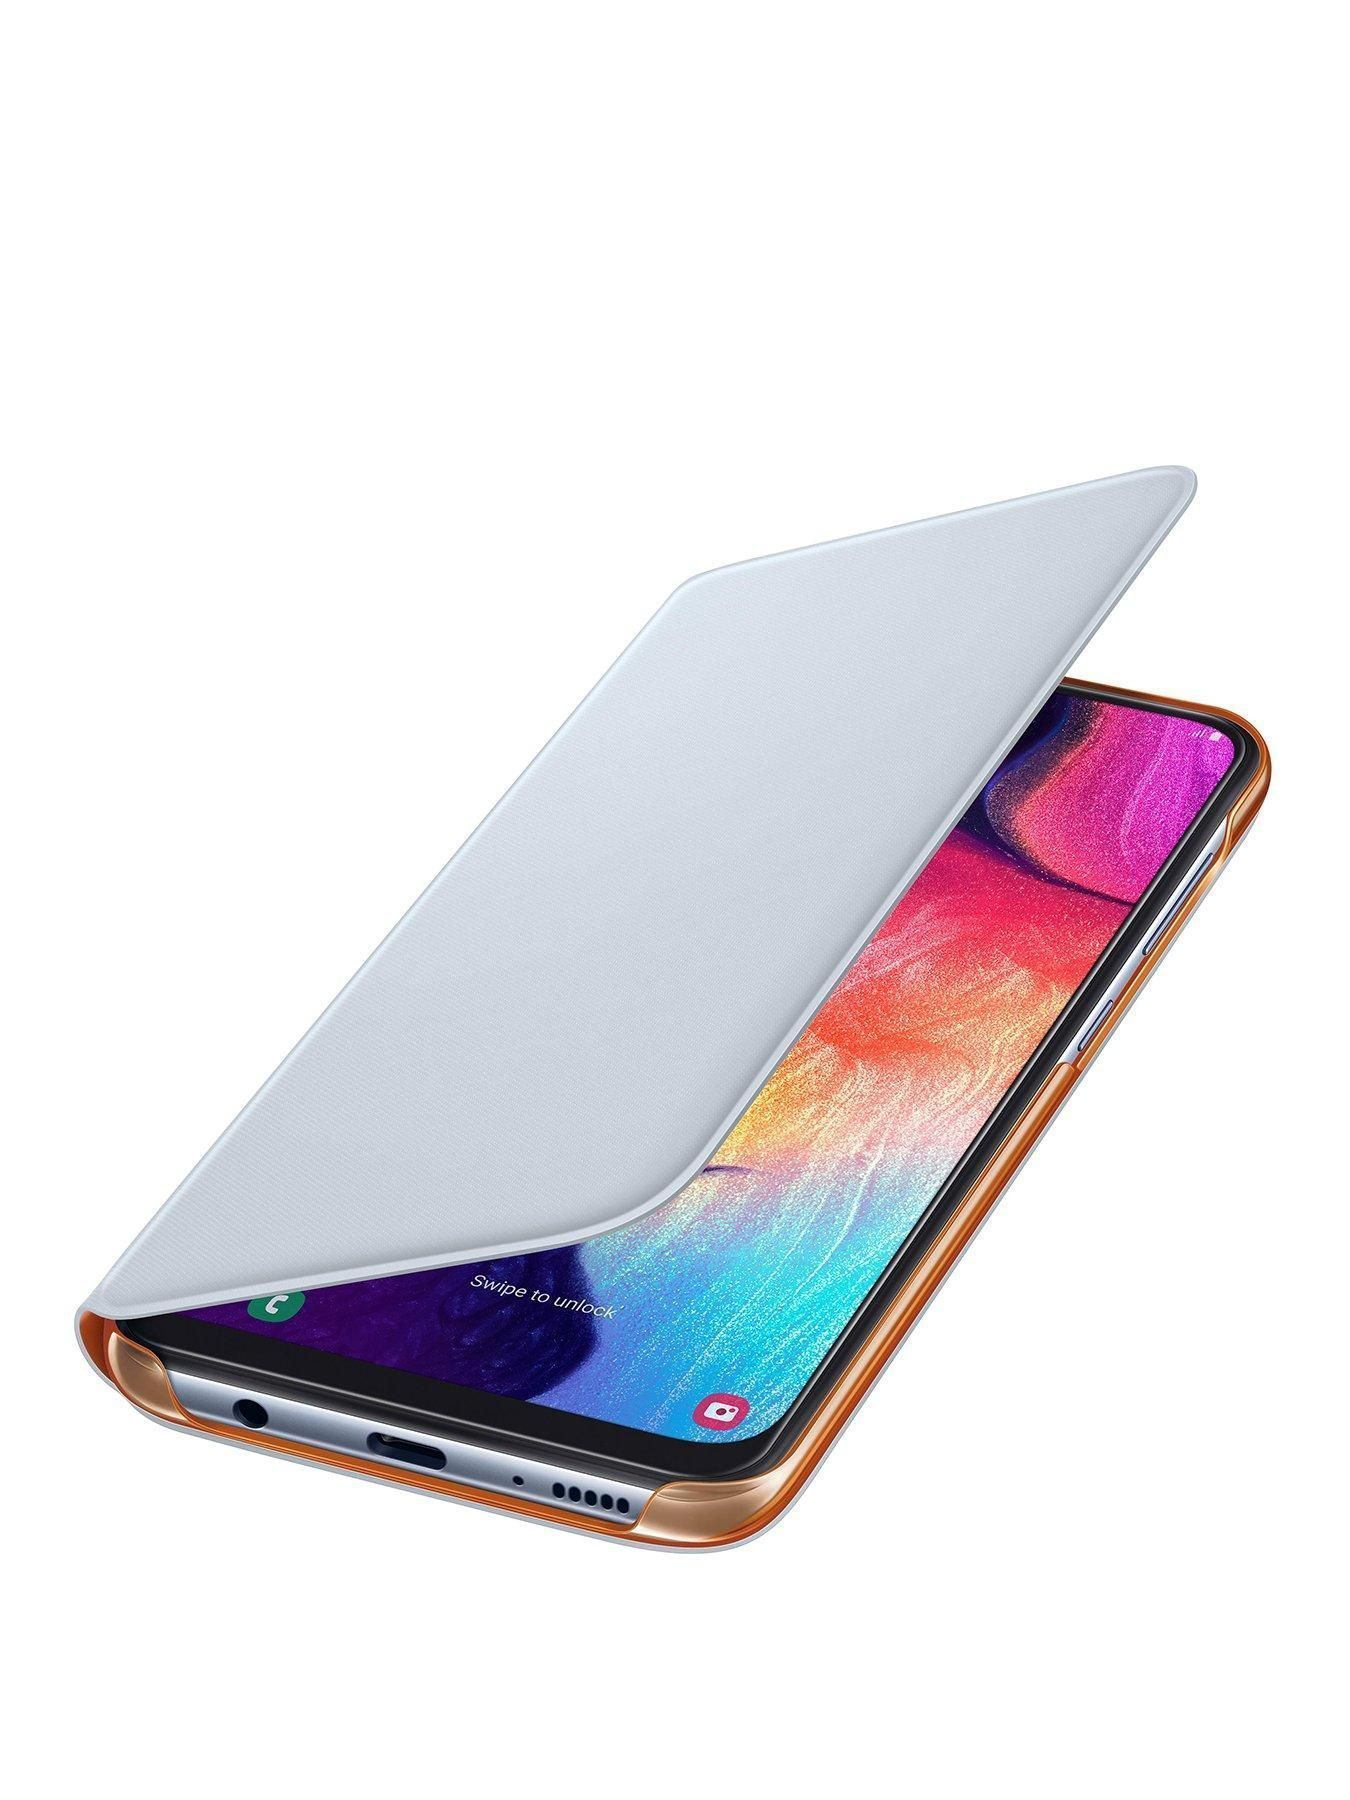 Galaxy A50 Wallet Cover White In 2020 Samsung Samsung Galaxy Galaxy